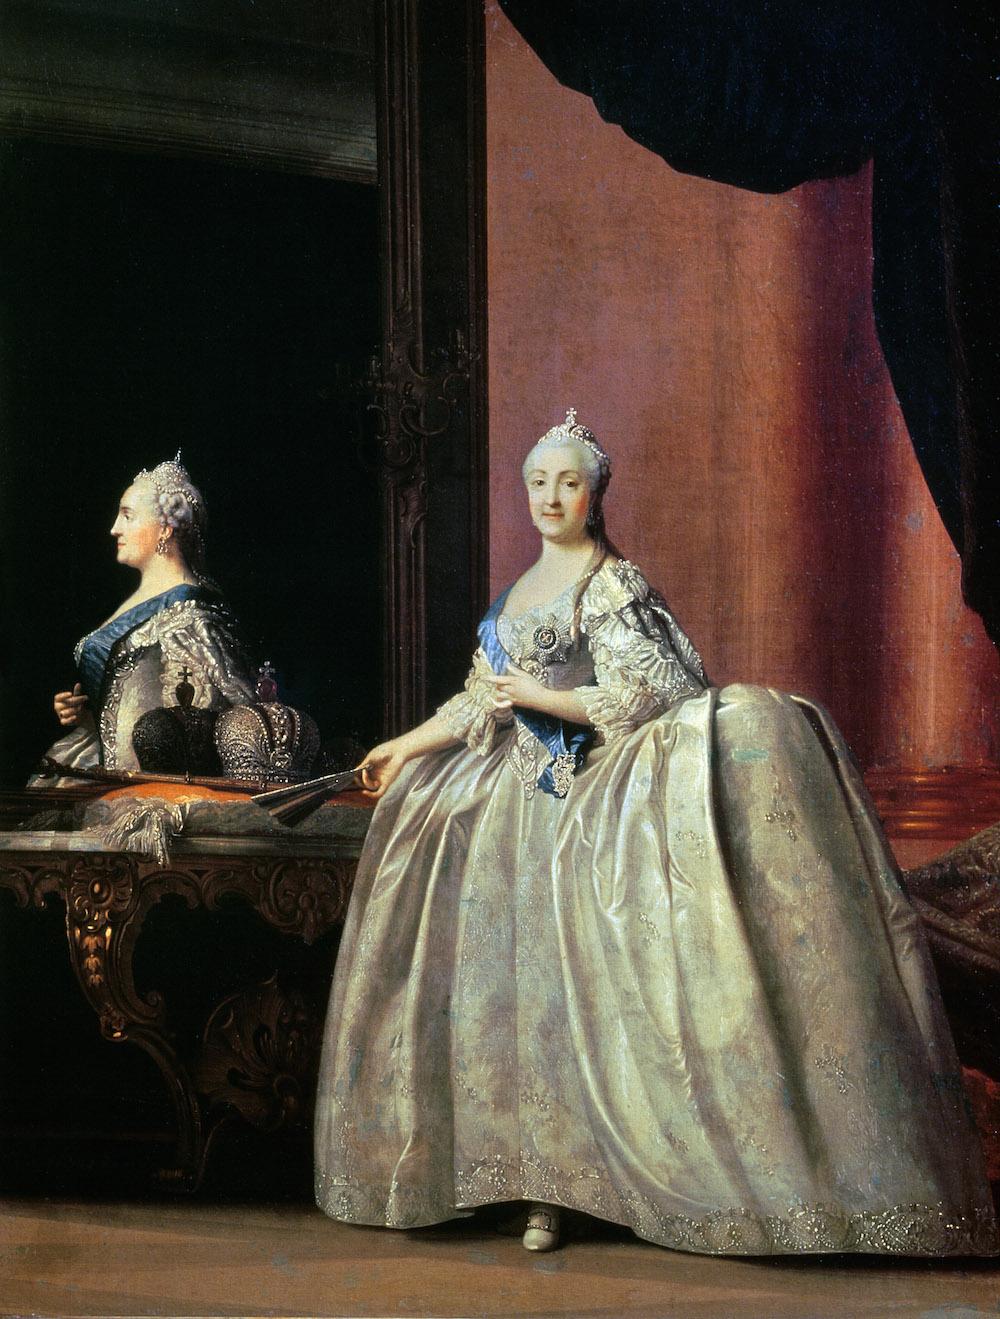 Empress Catherine II before the Mirror, 1779, Vigilus Eriksen / State Russian Museum, St. Petersburg, Russia / Bridgeman Images